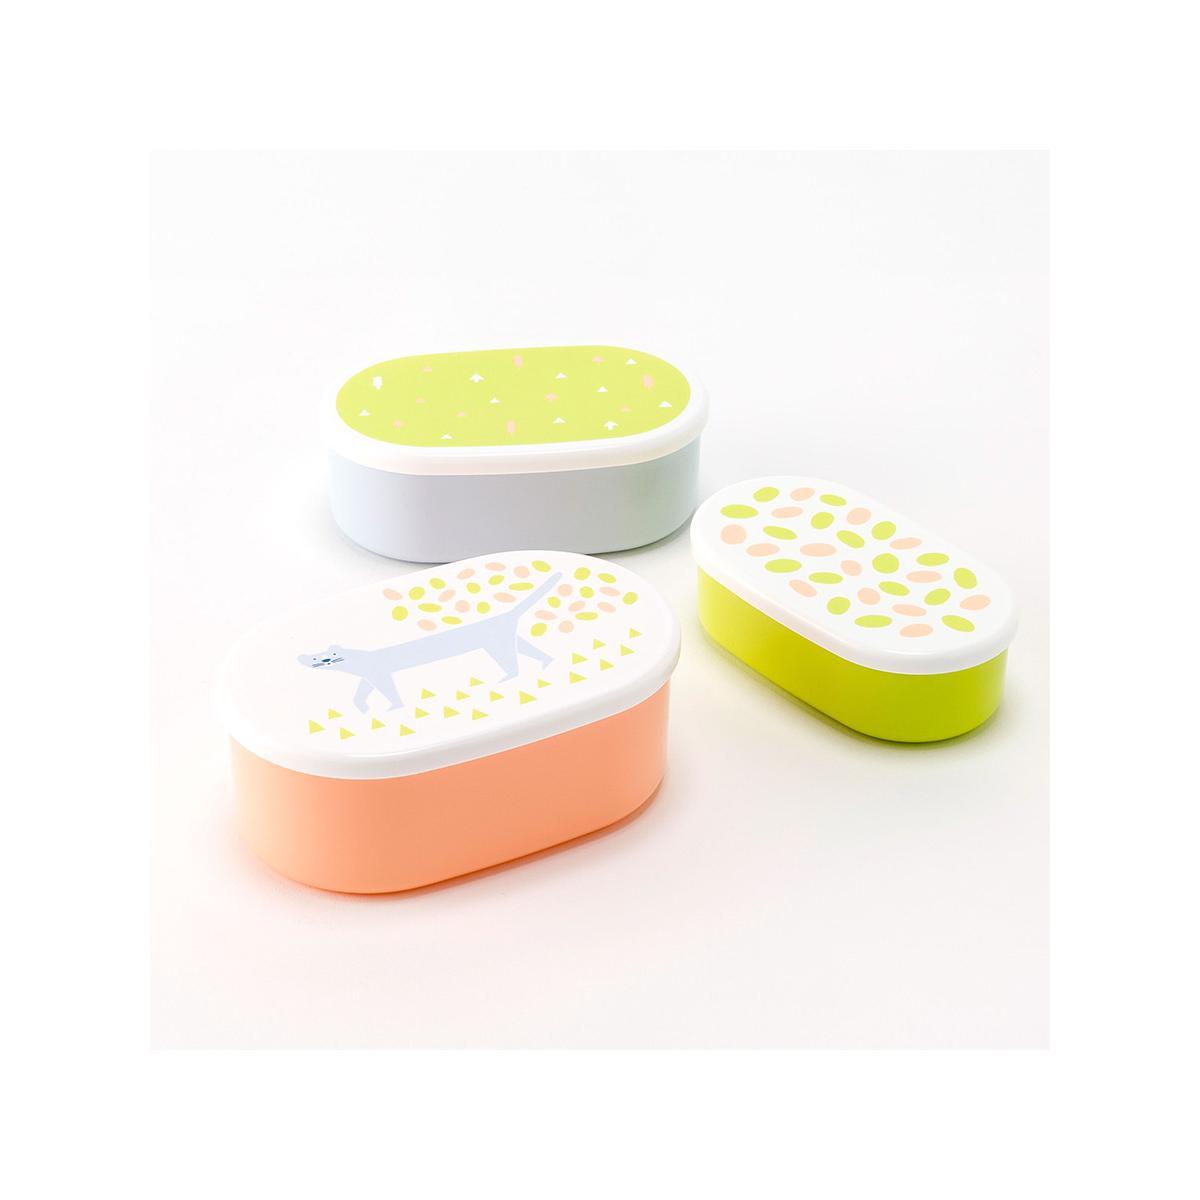 14 x 5cm PP box set (BPA free) - Cat print